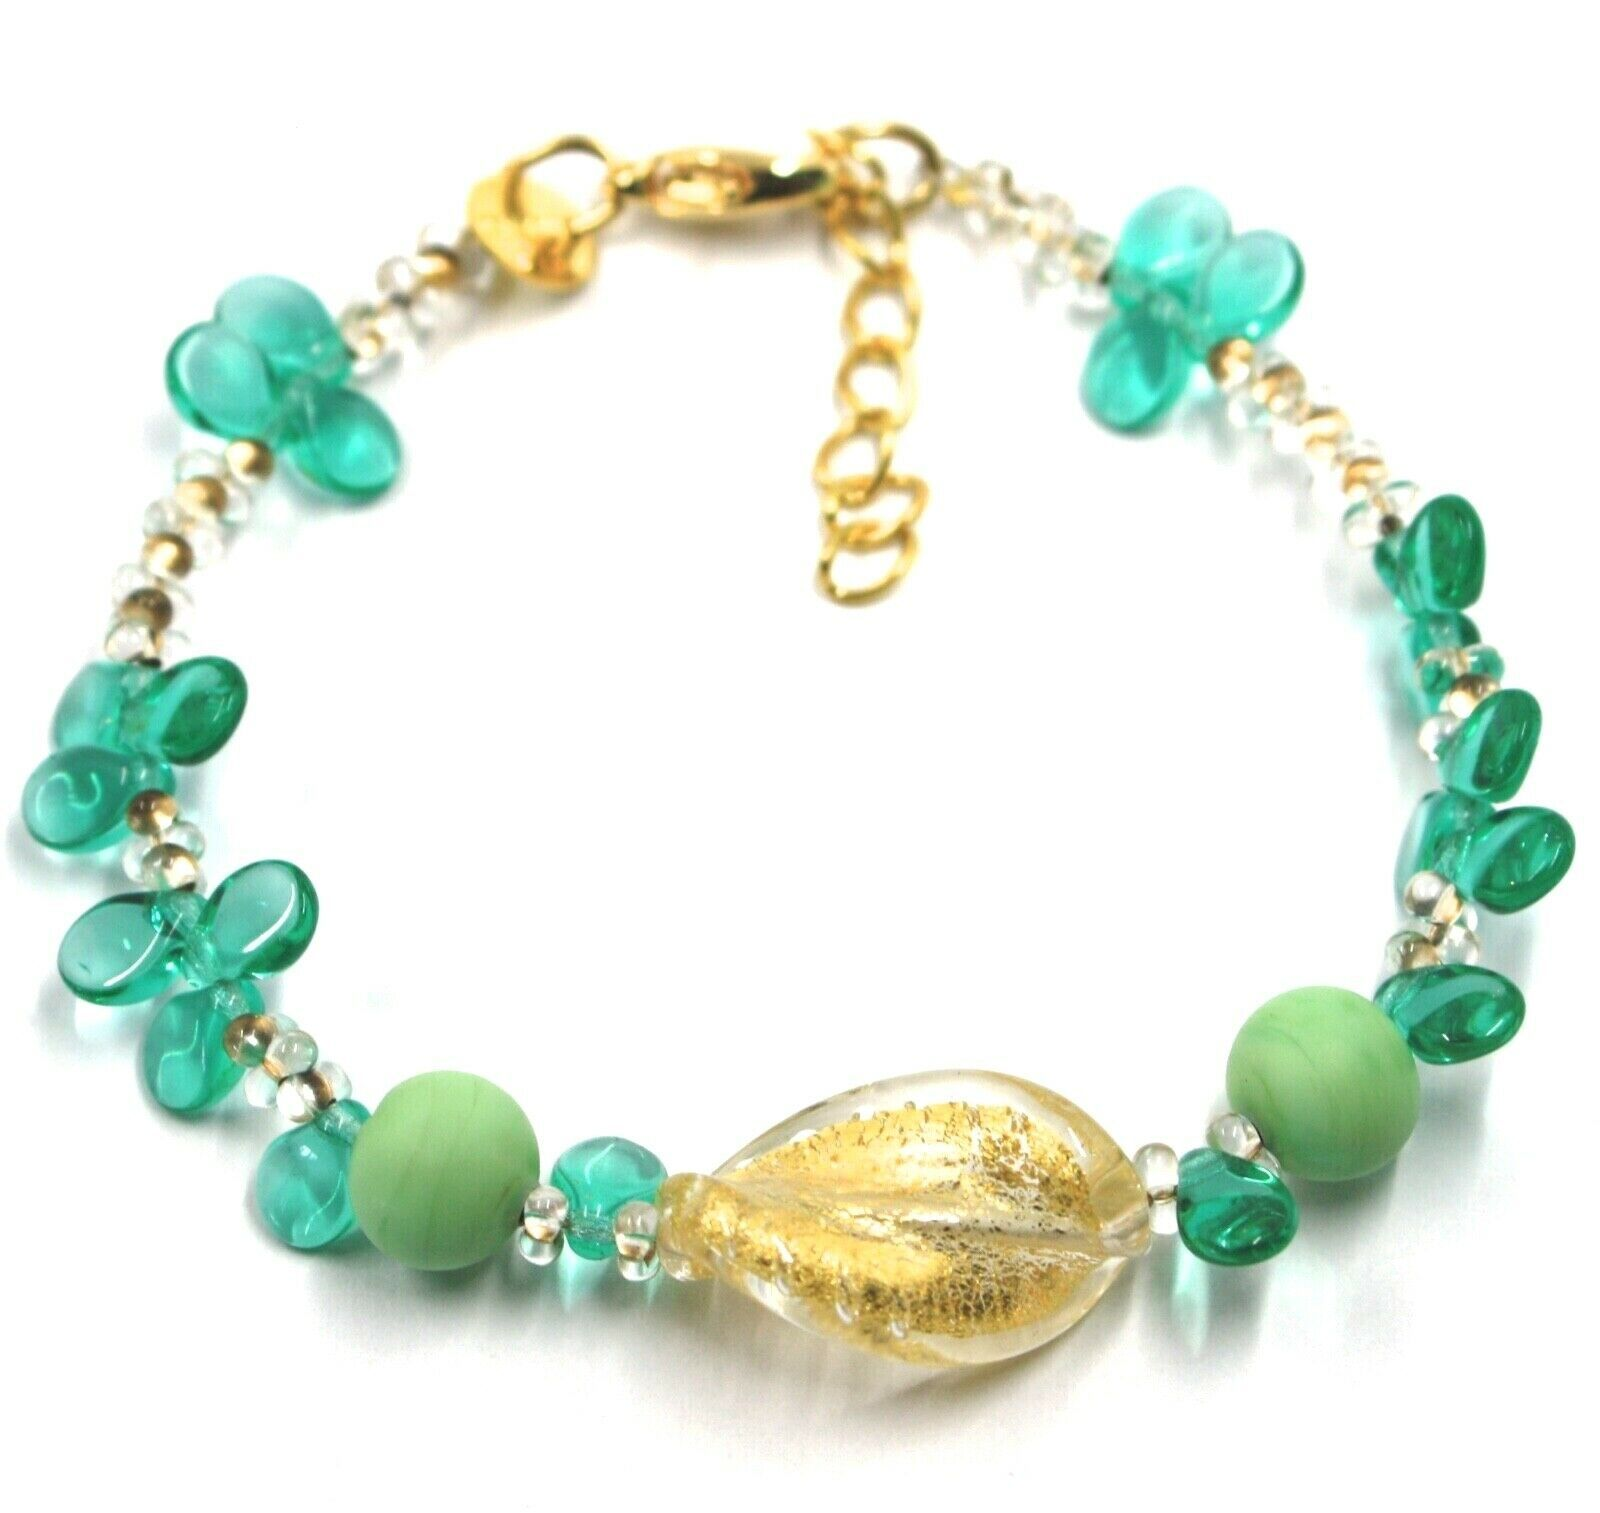 BRACELET PETALS DROPS, SATIN SPHERE SPIRAL WAVE YELLOW GREEN MURANO GLASS ITALY